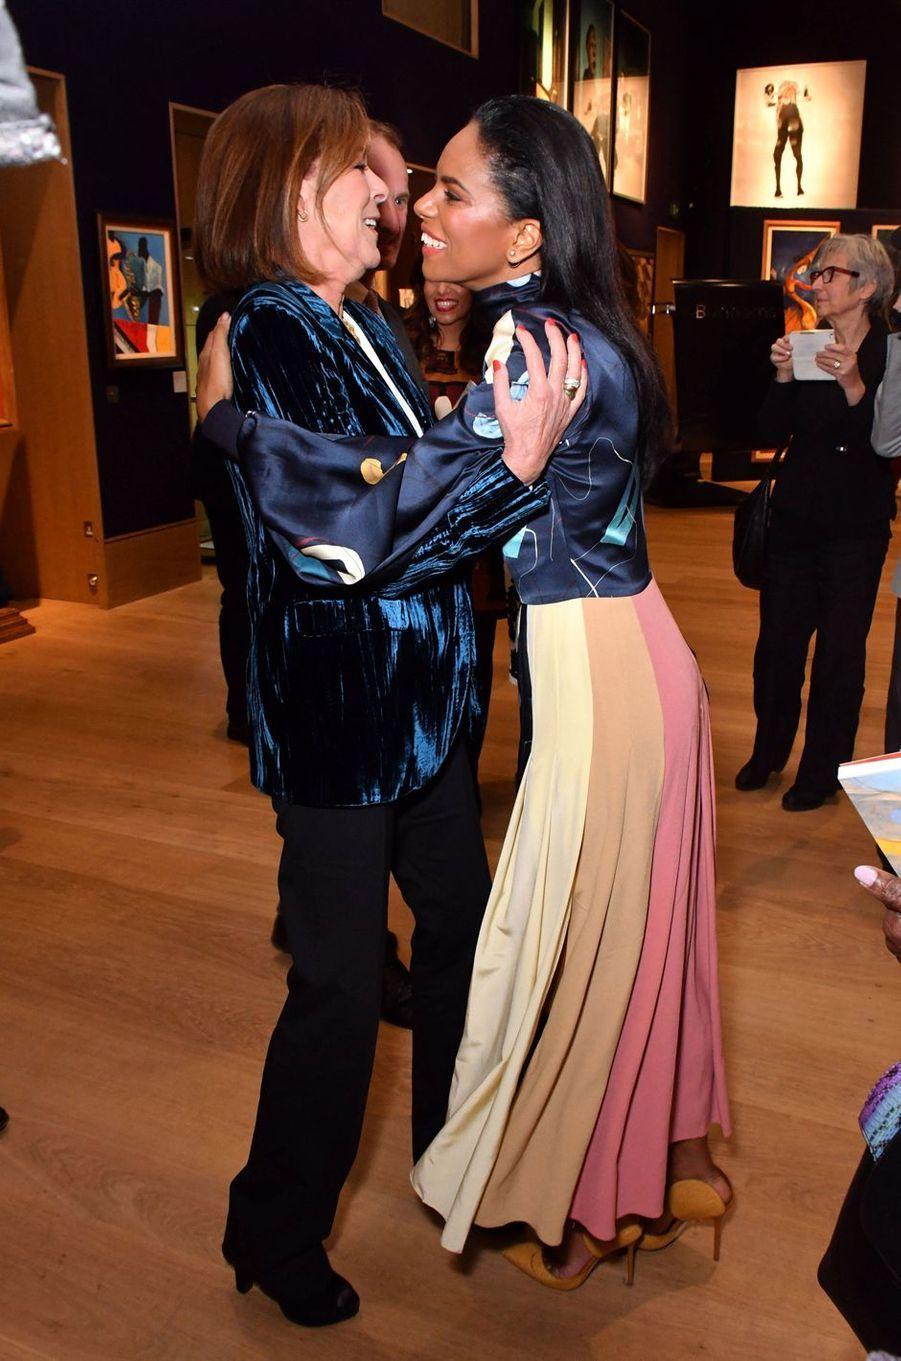 La princesse Caroline de Hanovre avec Noëlla Coursaris Musunka à Londres, le 1er octobre 2018